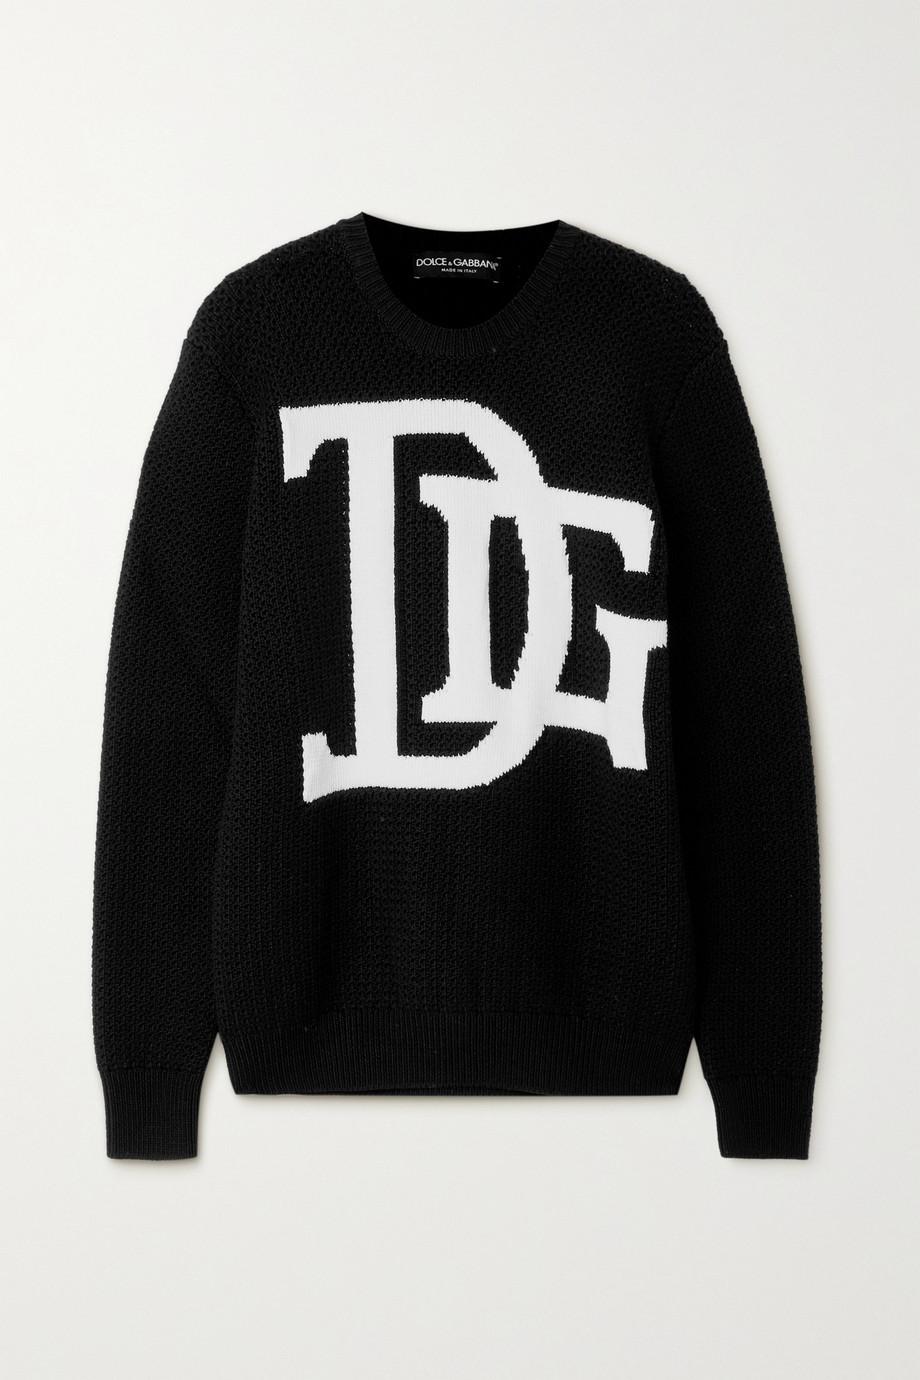 Dolce & Gabbana Intarsia wool sweater